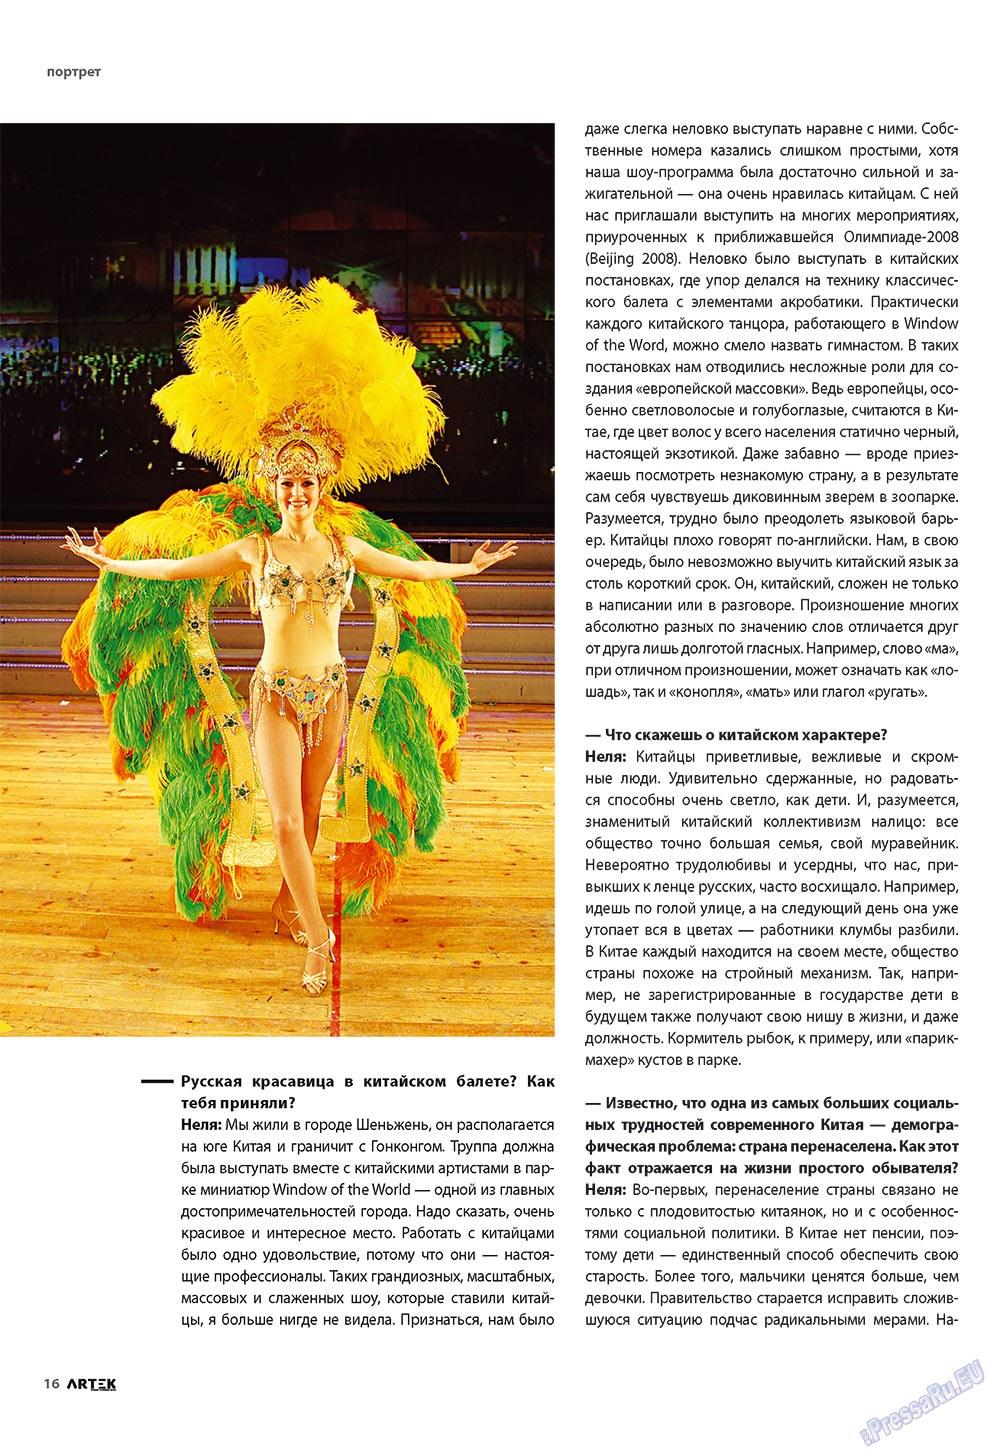 Артек (журнал). 2009 год, номер 6, стр. 18